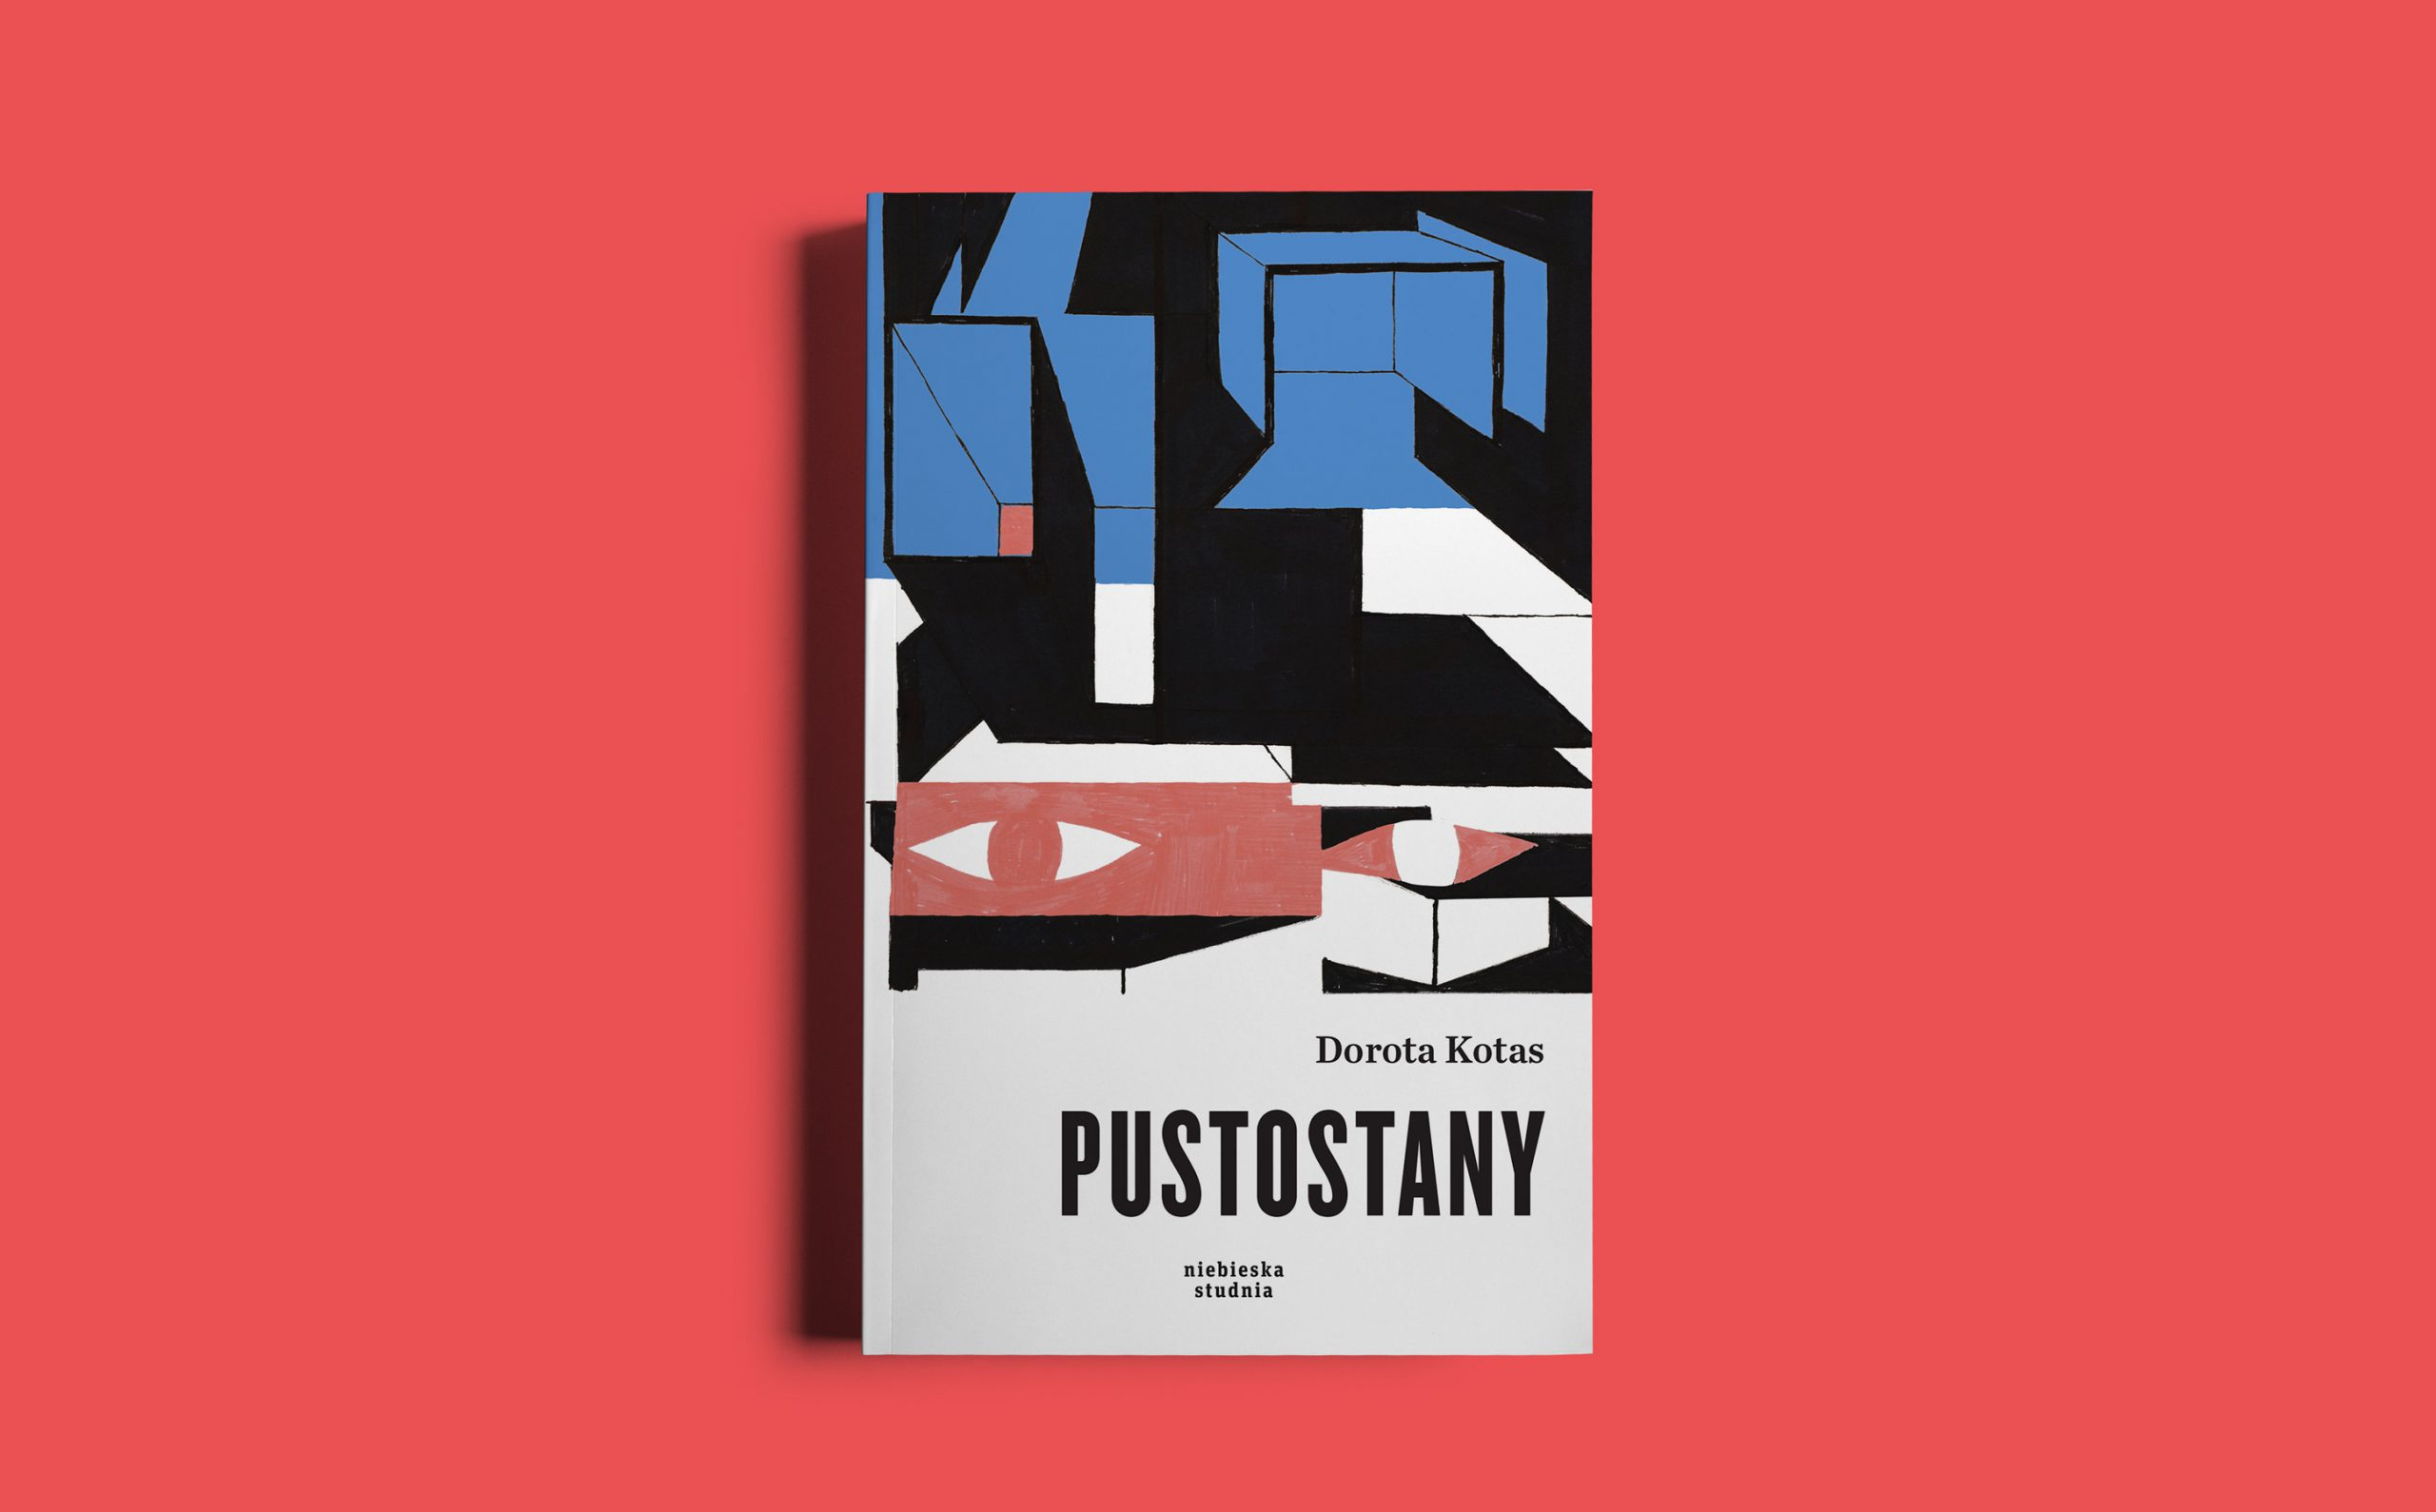 Pustostany - Dorota kotas